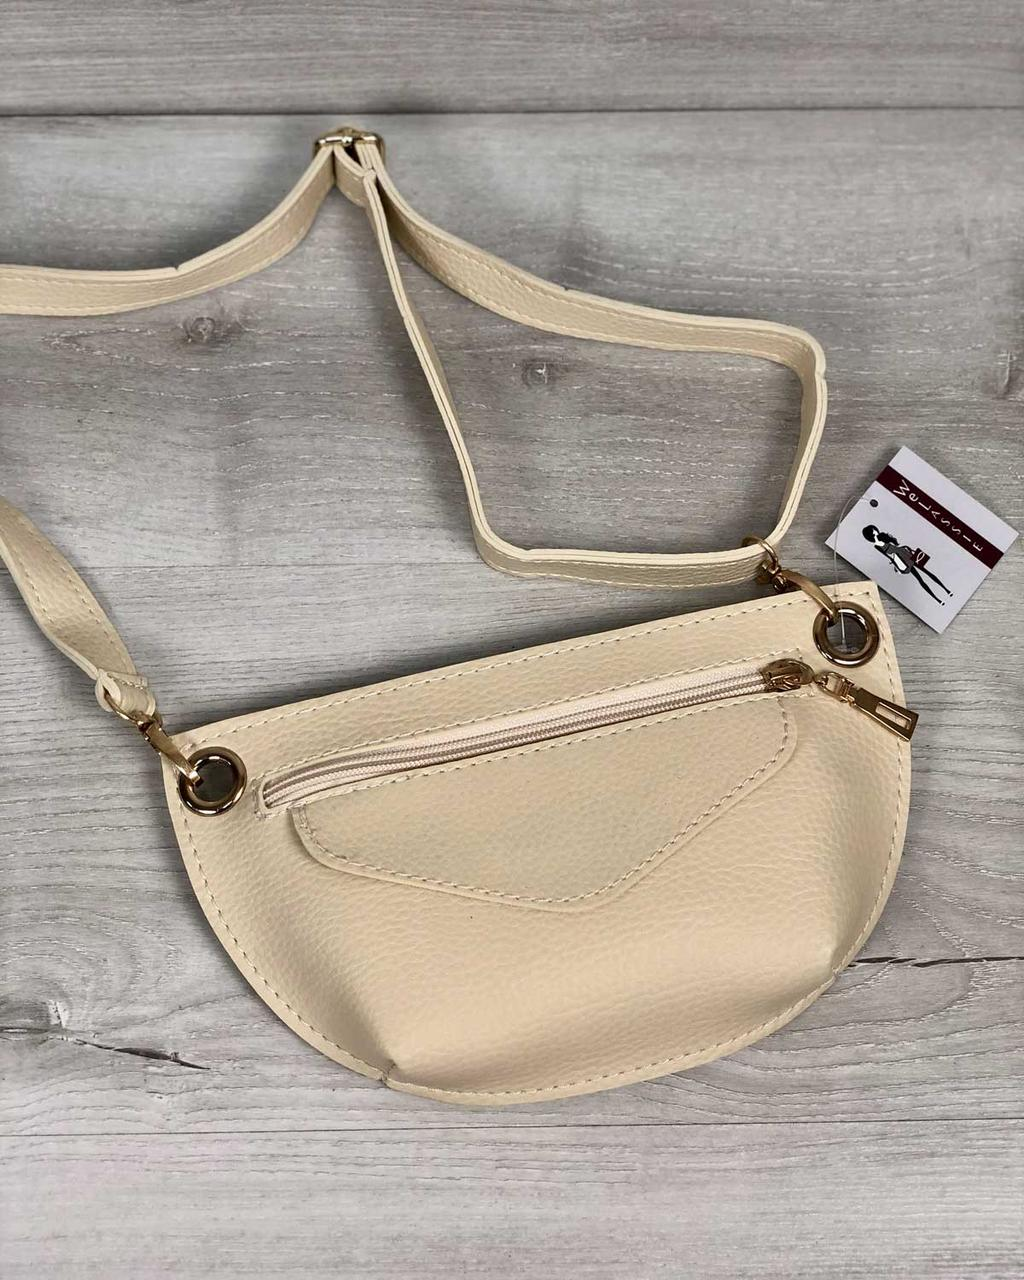 Женская сумка WeLassie сумка WeLassie на пояс- клатч Нана бежевого цвета (61009)